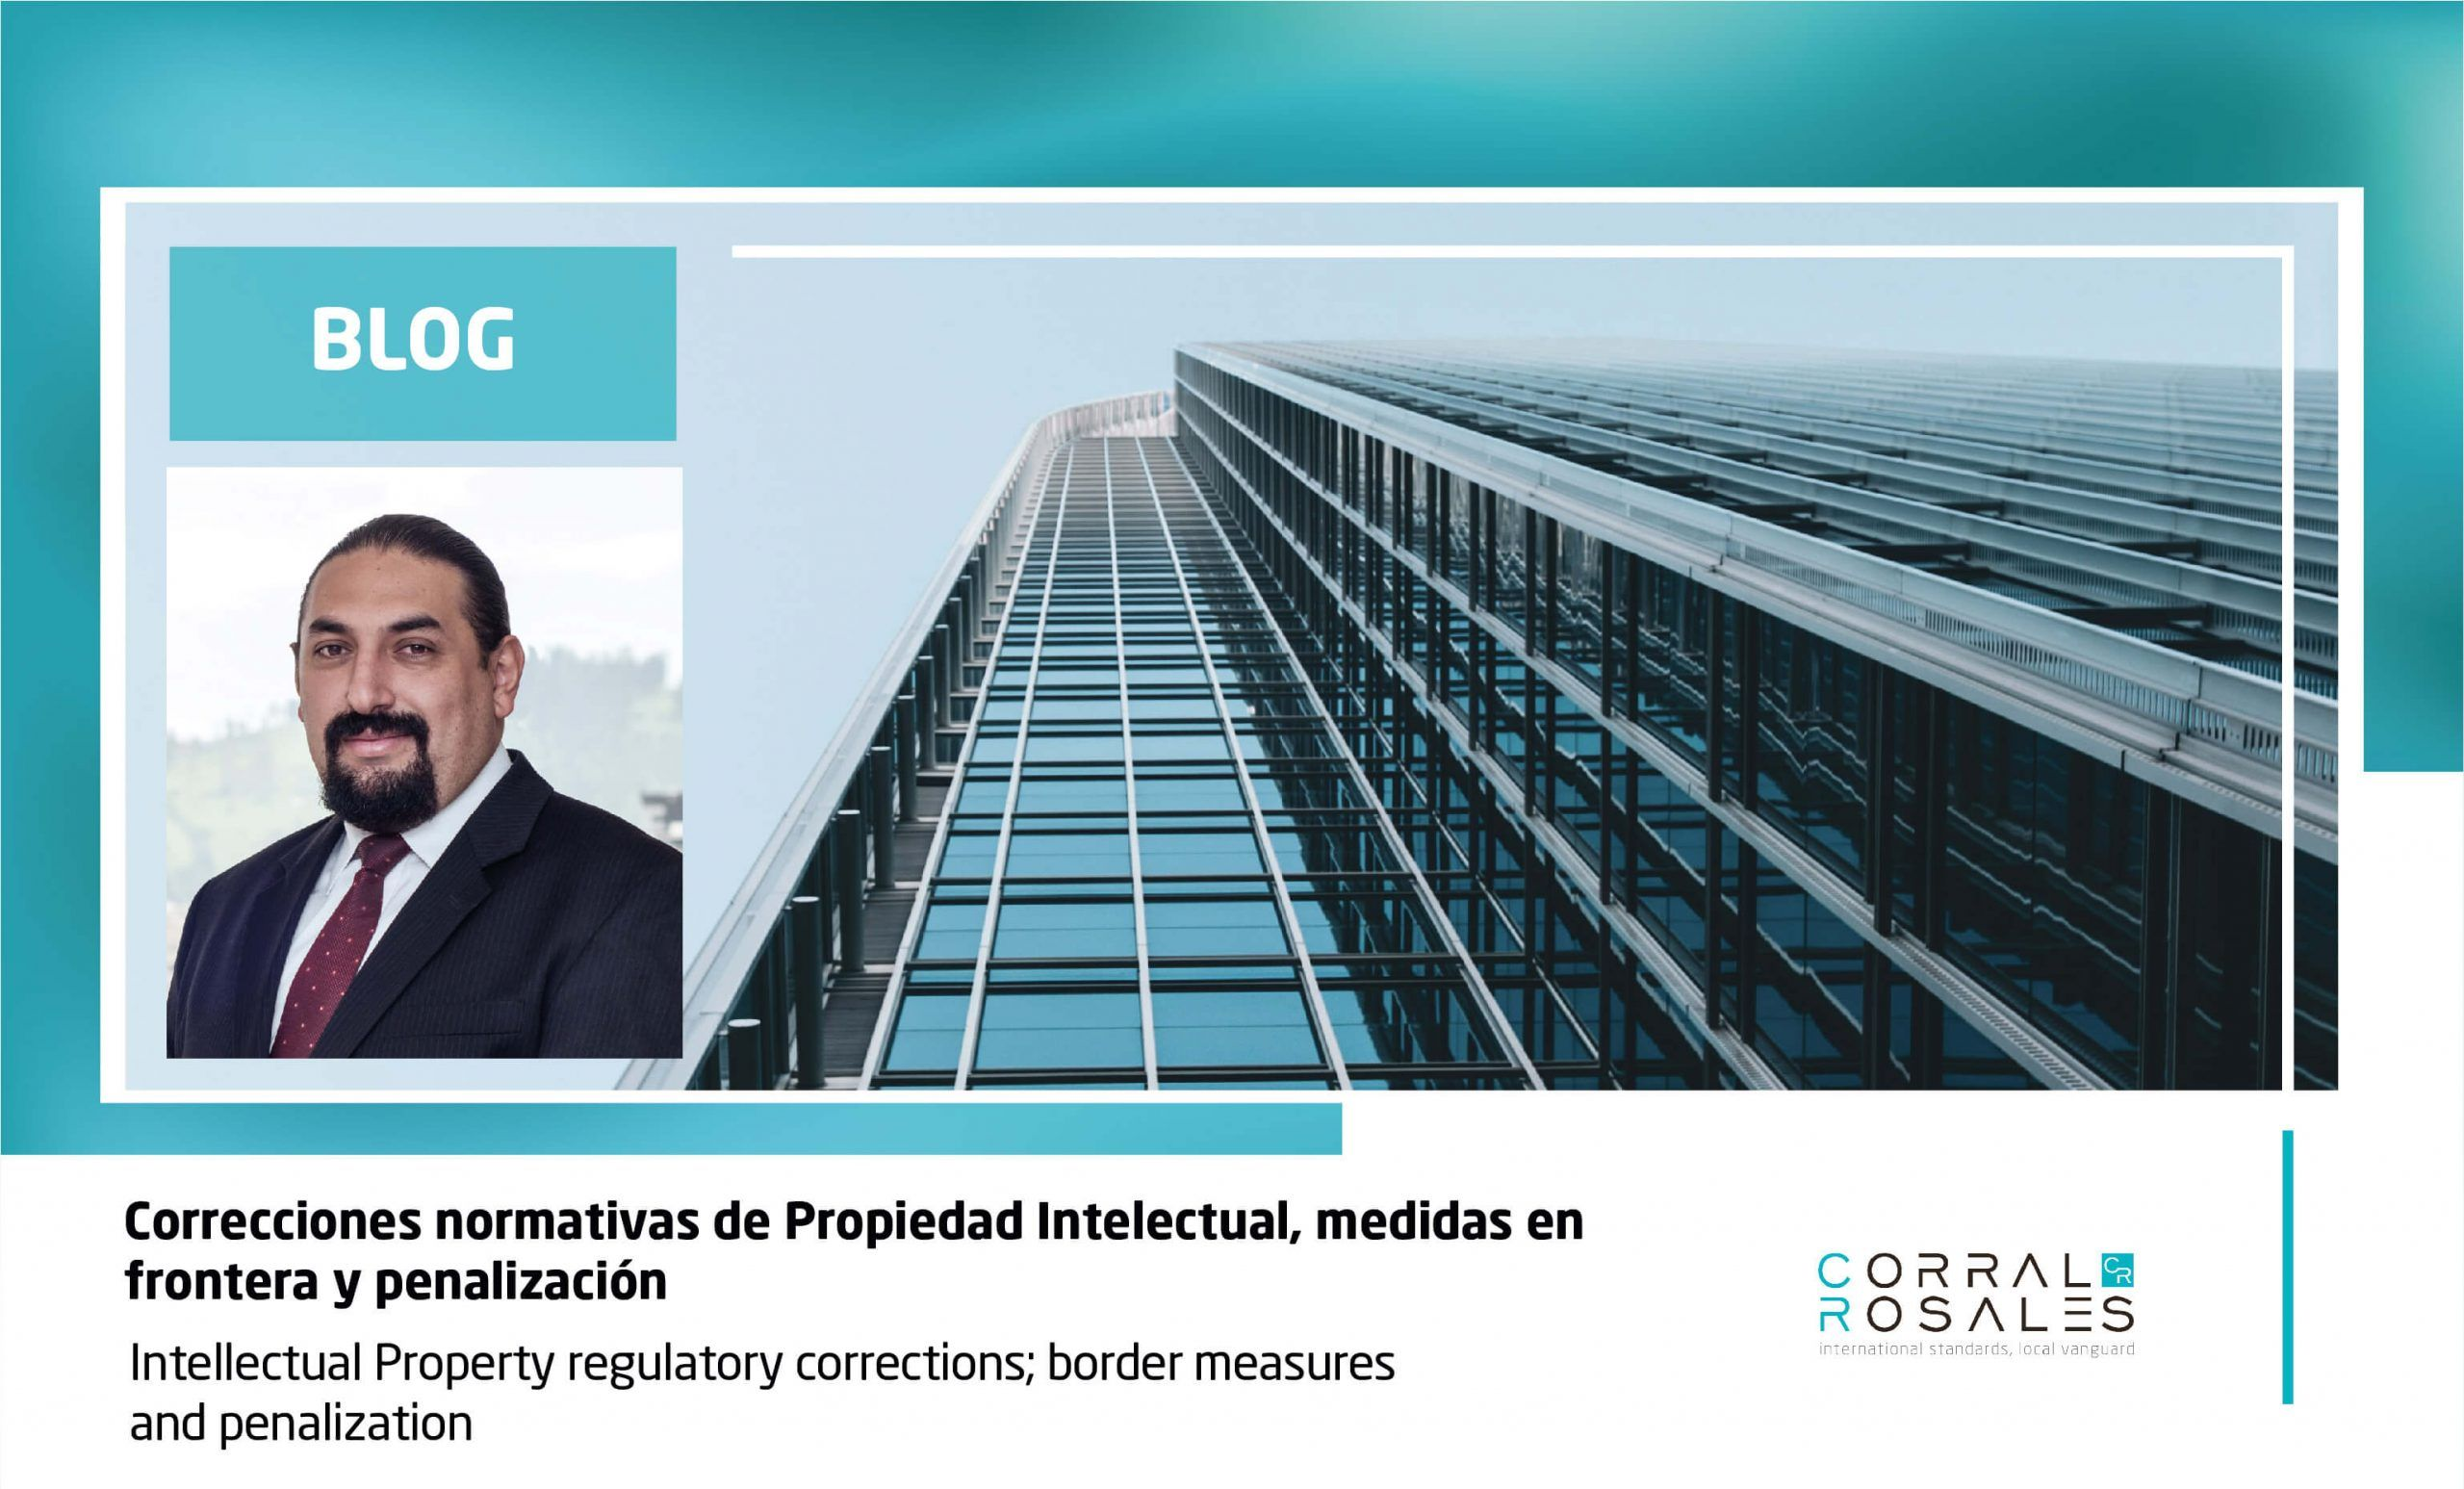 Intellectual Property regulatory corrections; border measures and penalization - CorralRosales - Lawyers Ecuador